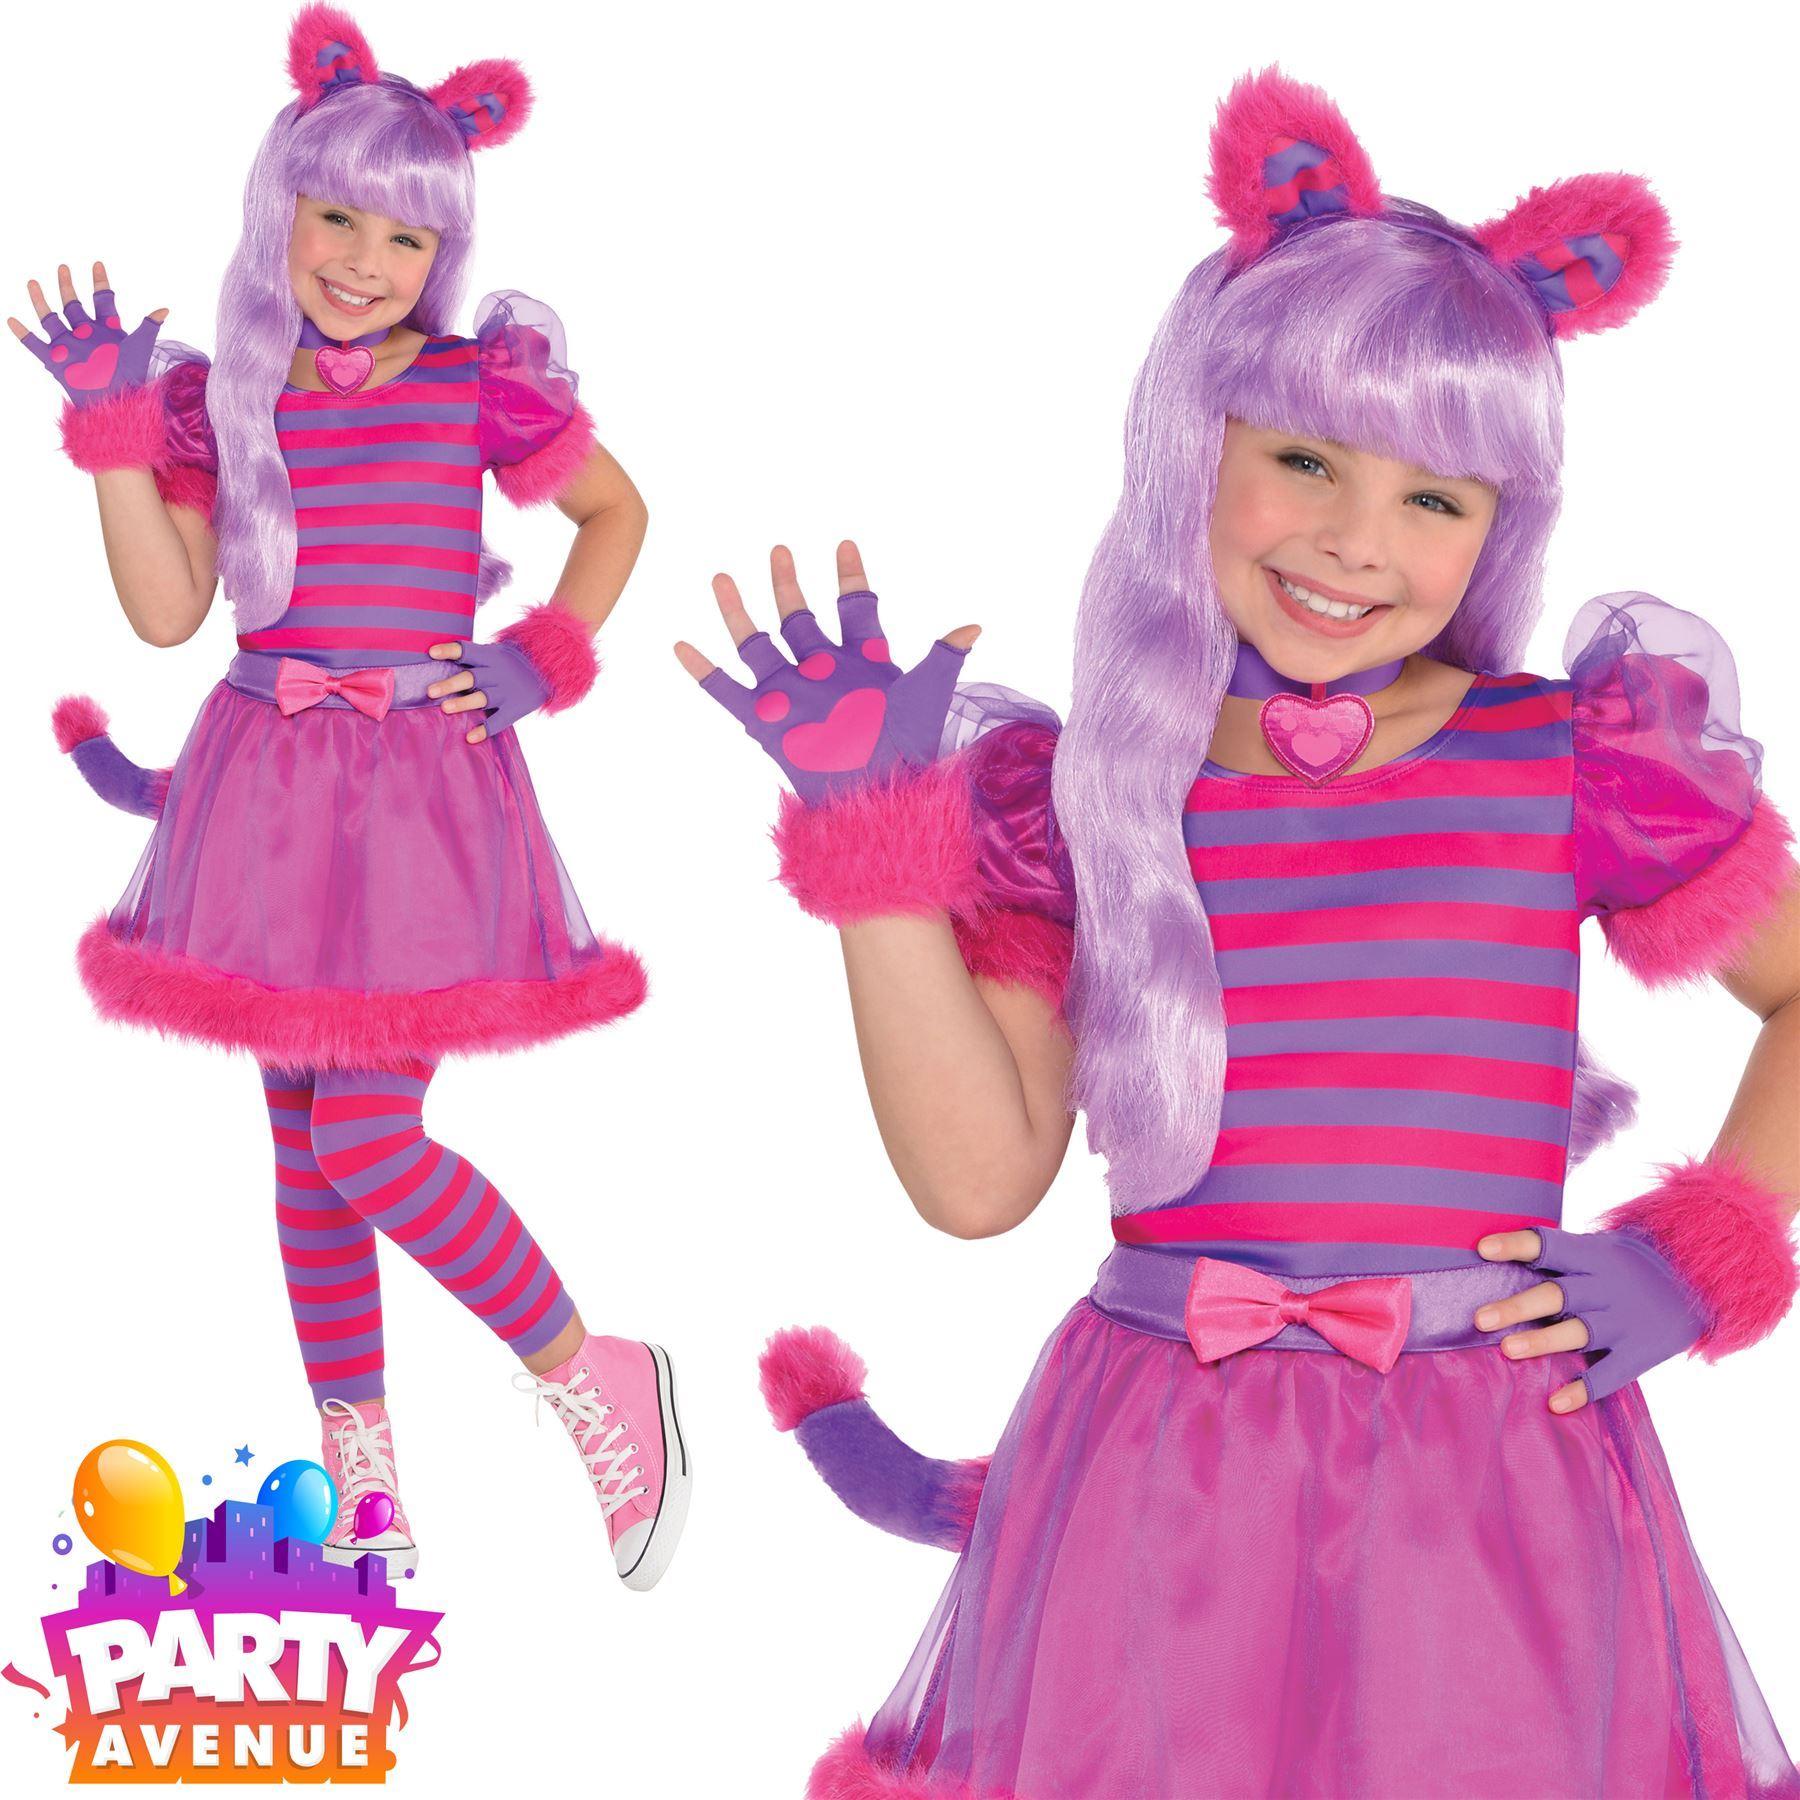 Cheshire Cat Alice in Wonderland Fairytale Book Day Week Girls Costume 10-12yrs